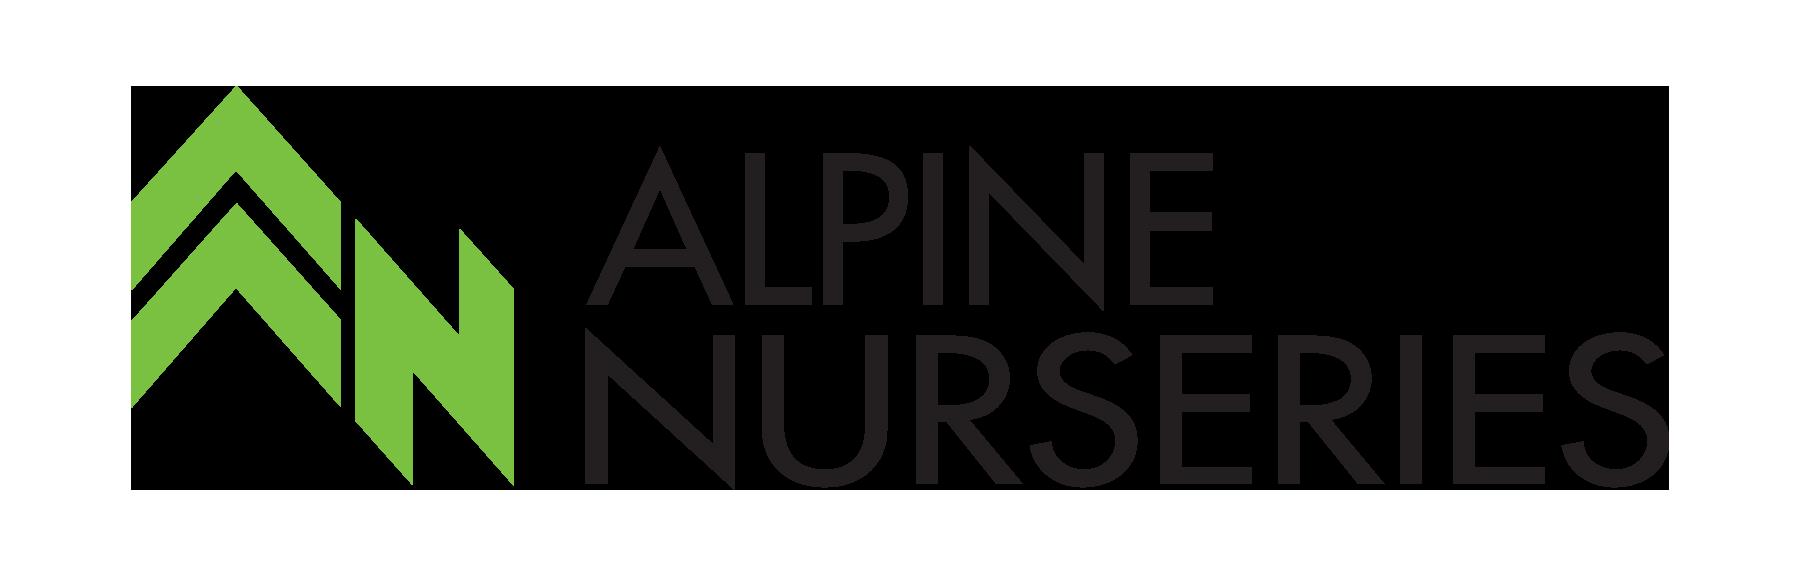 Alpine Nurseries logo